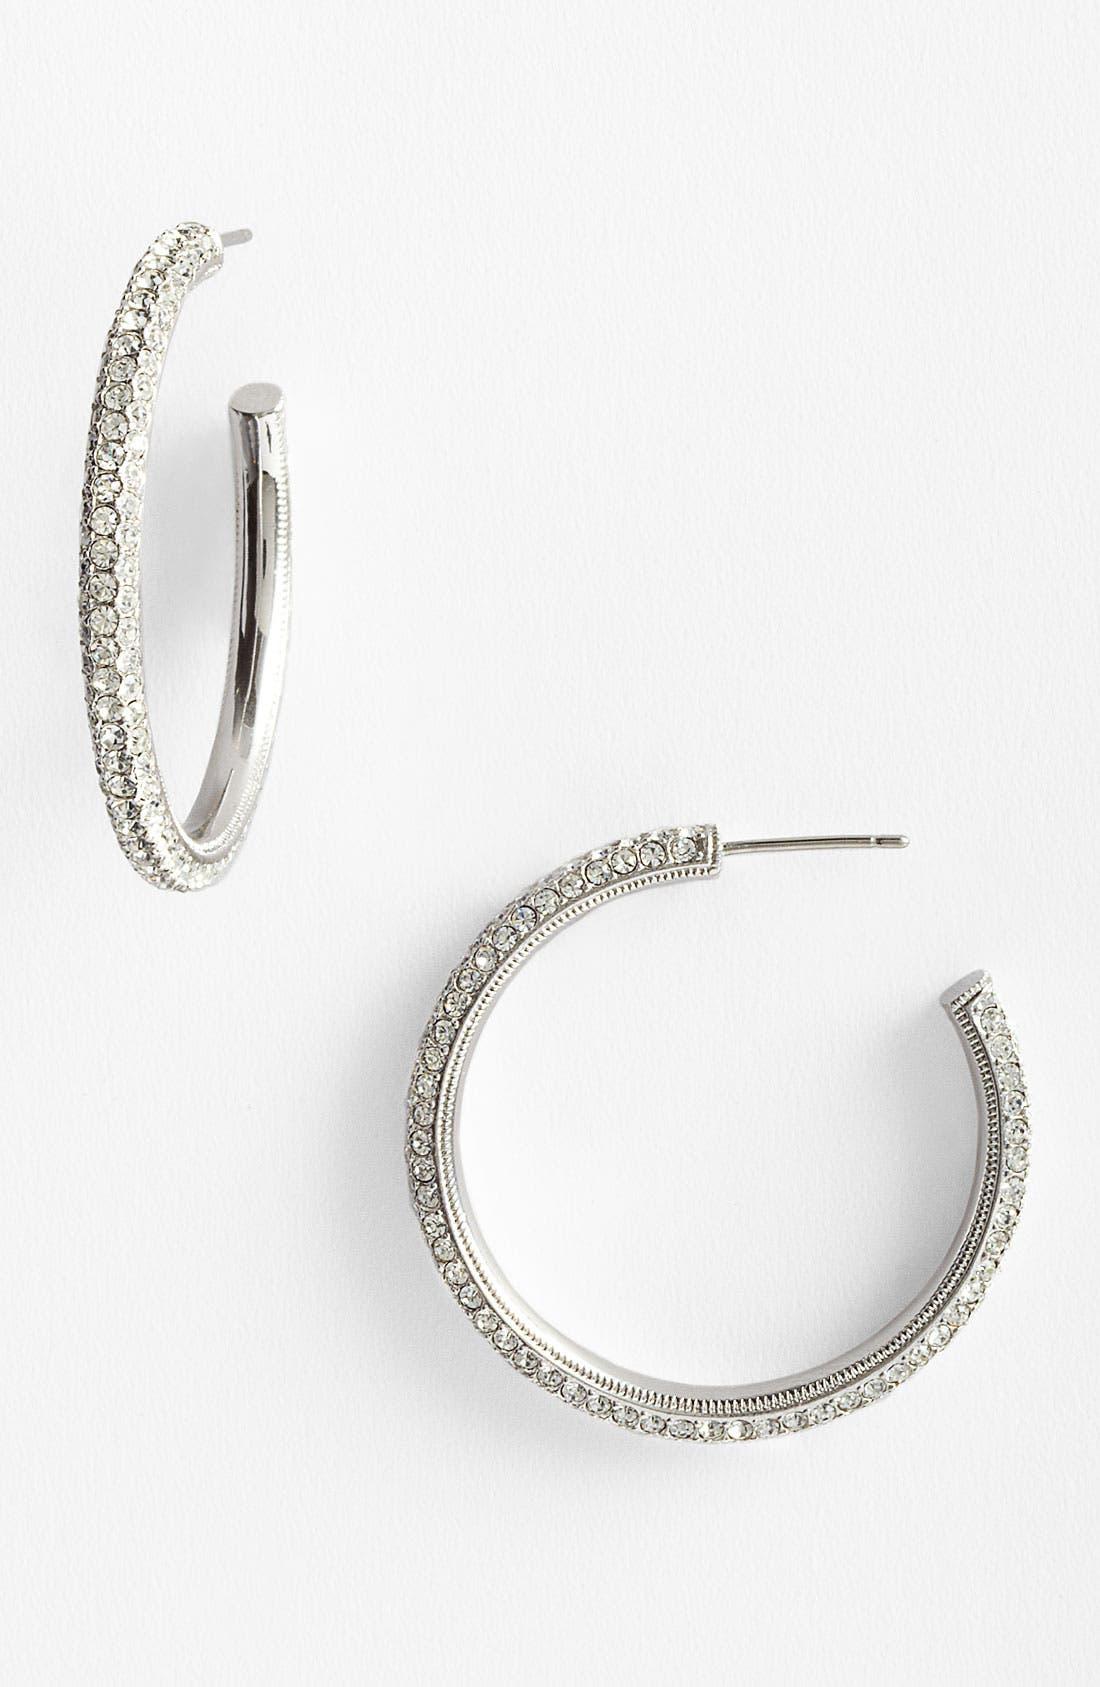 Main Image - Nadri 'Small Pavé Bombe' Hoop Earrings